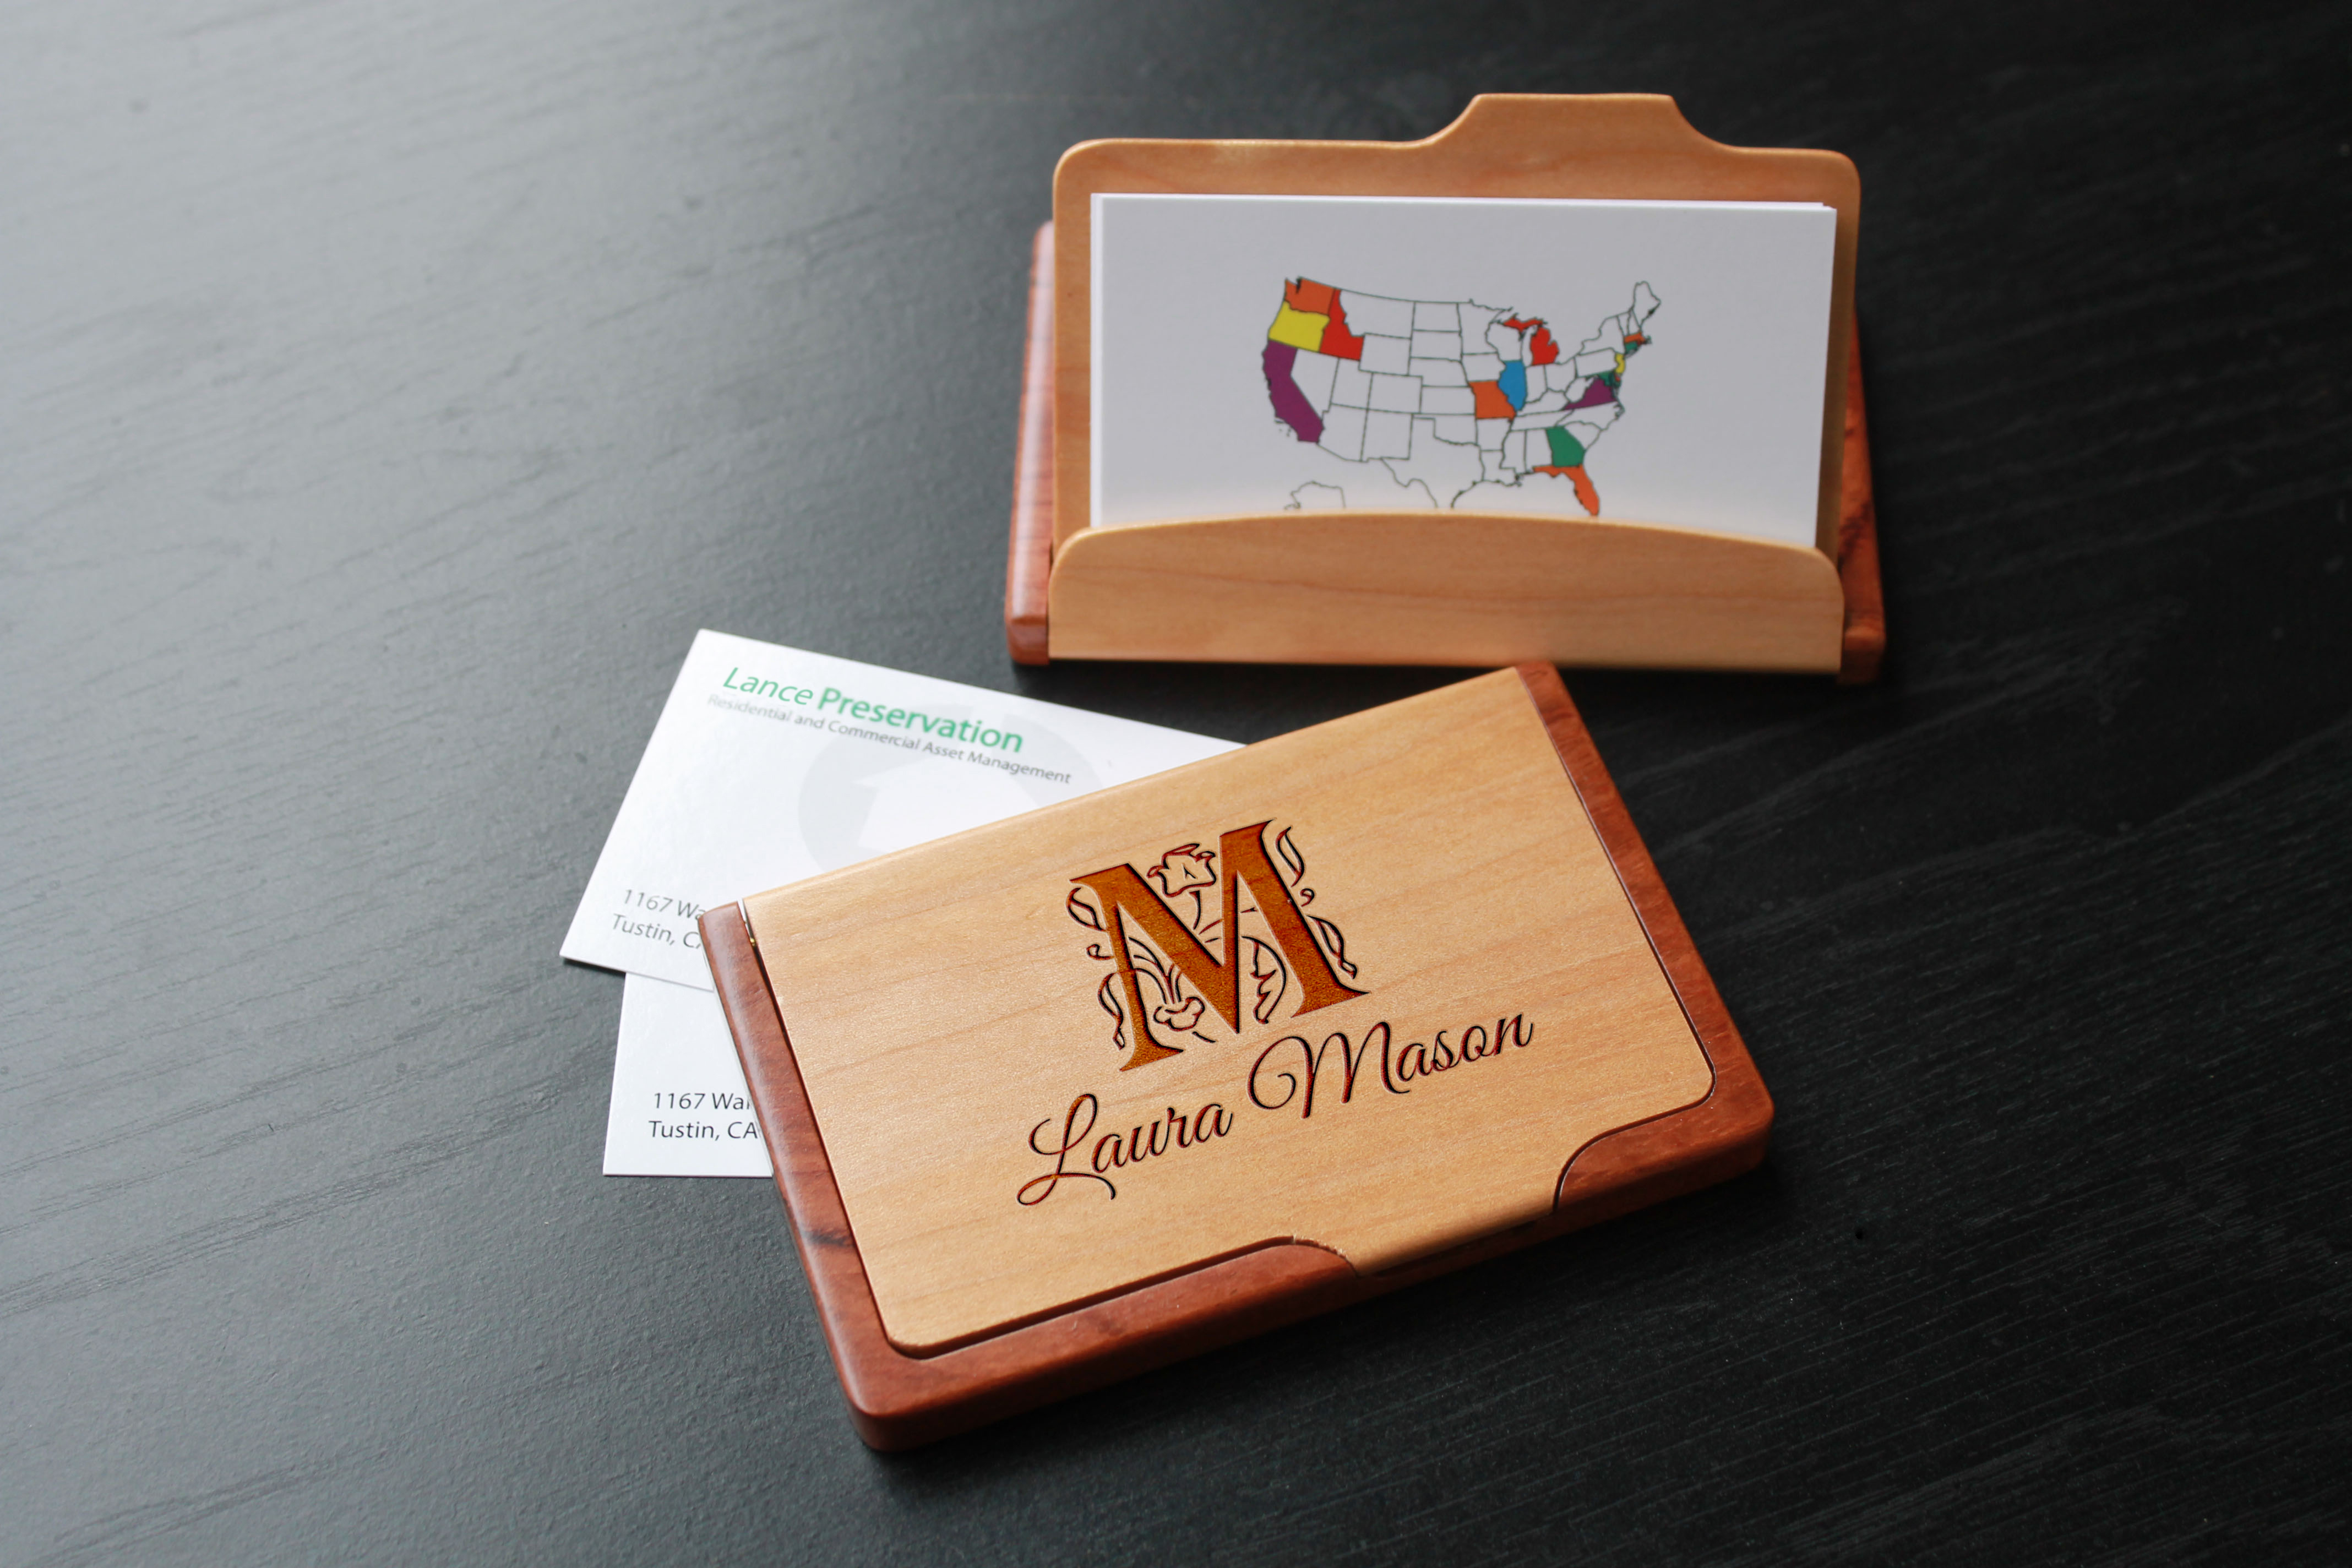 Personalized Wood Business Card Holder   Laura Mason - Etchey